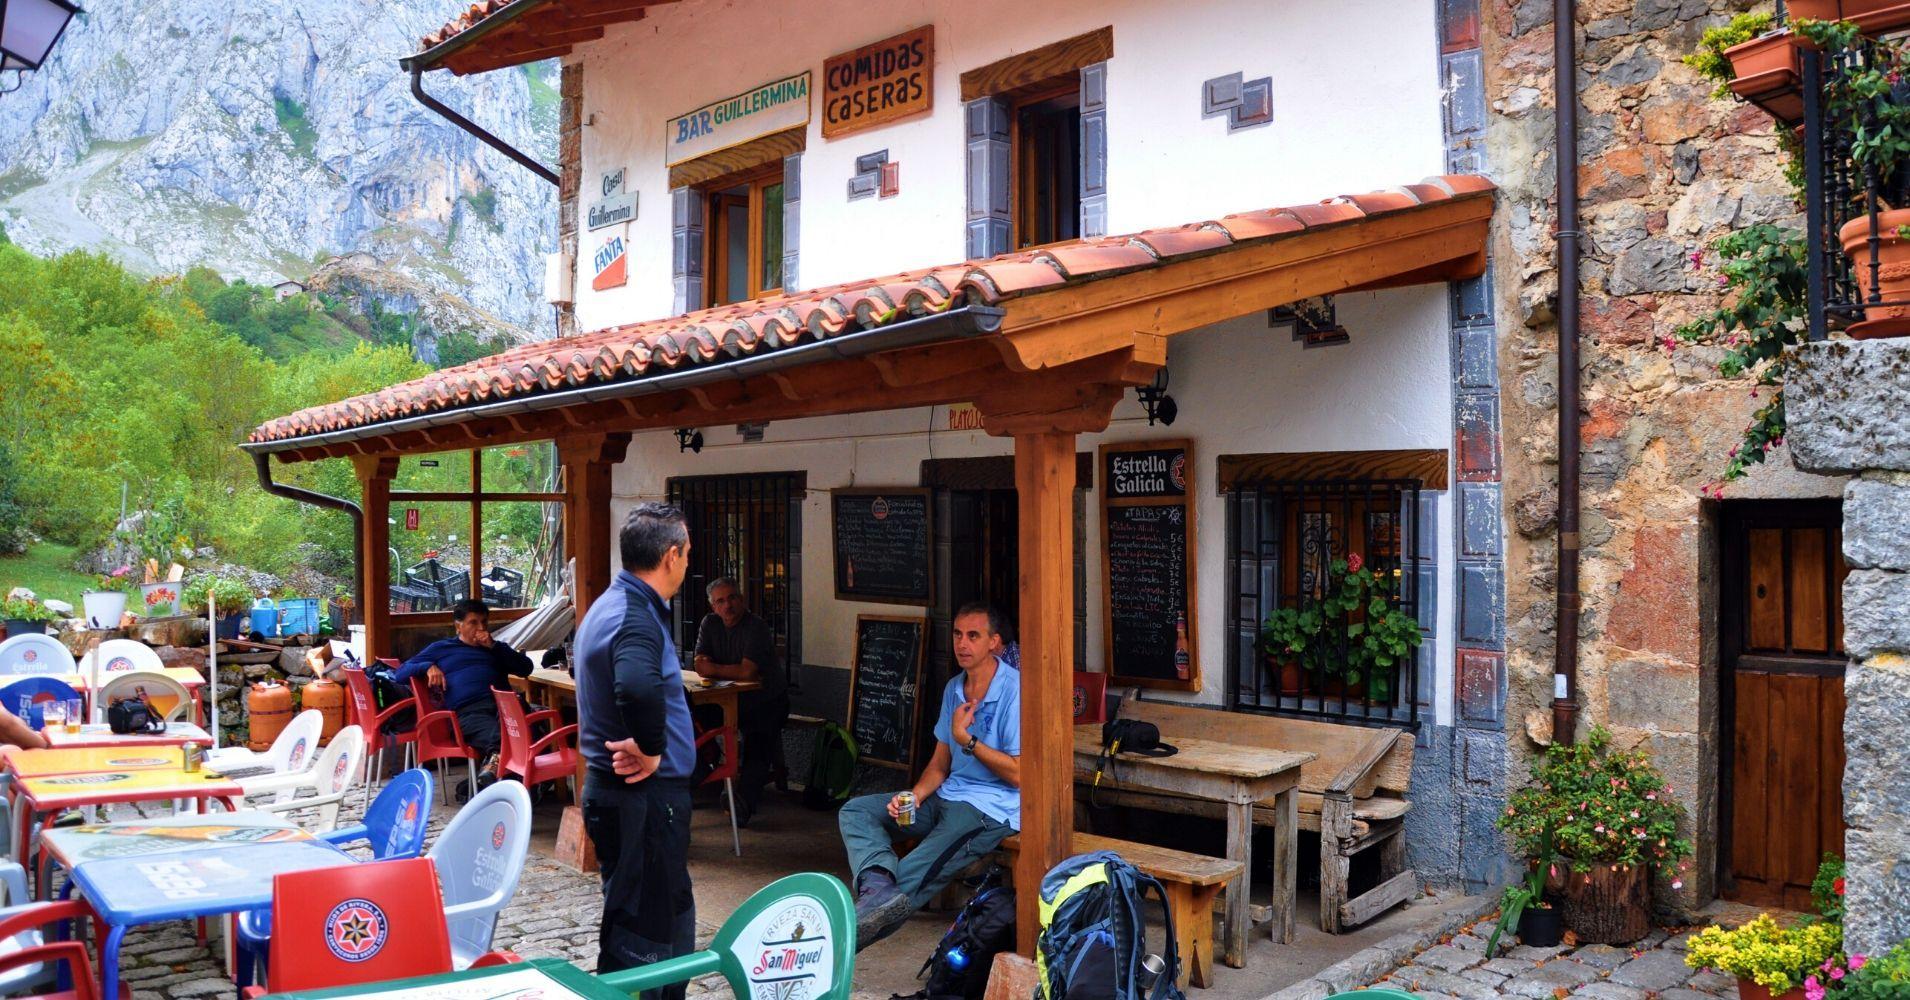 Casa Guillermina. Picos de Europa. Bulnes vivencia personal. Asturias.